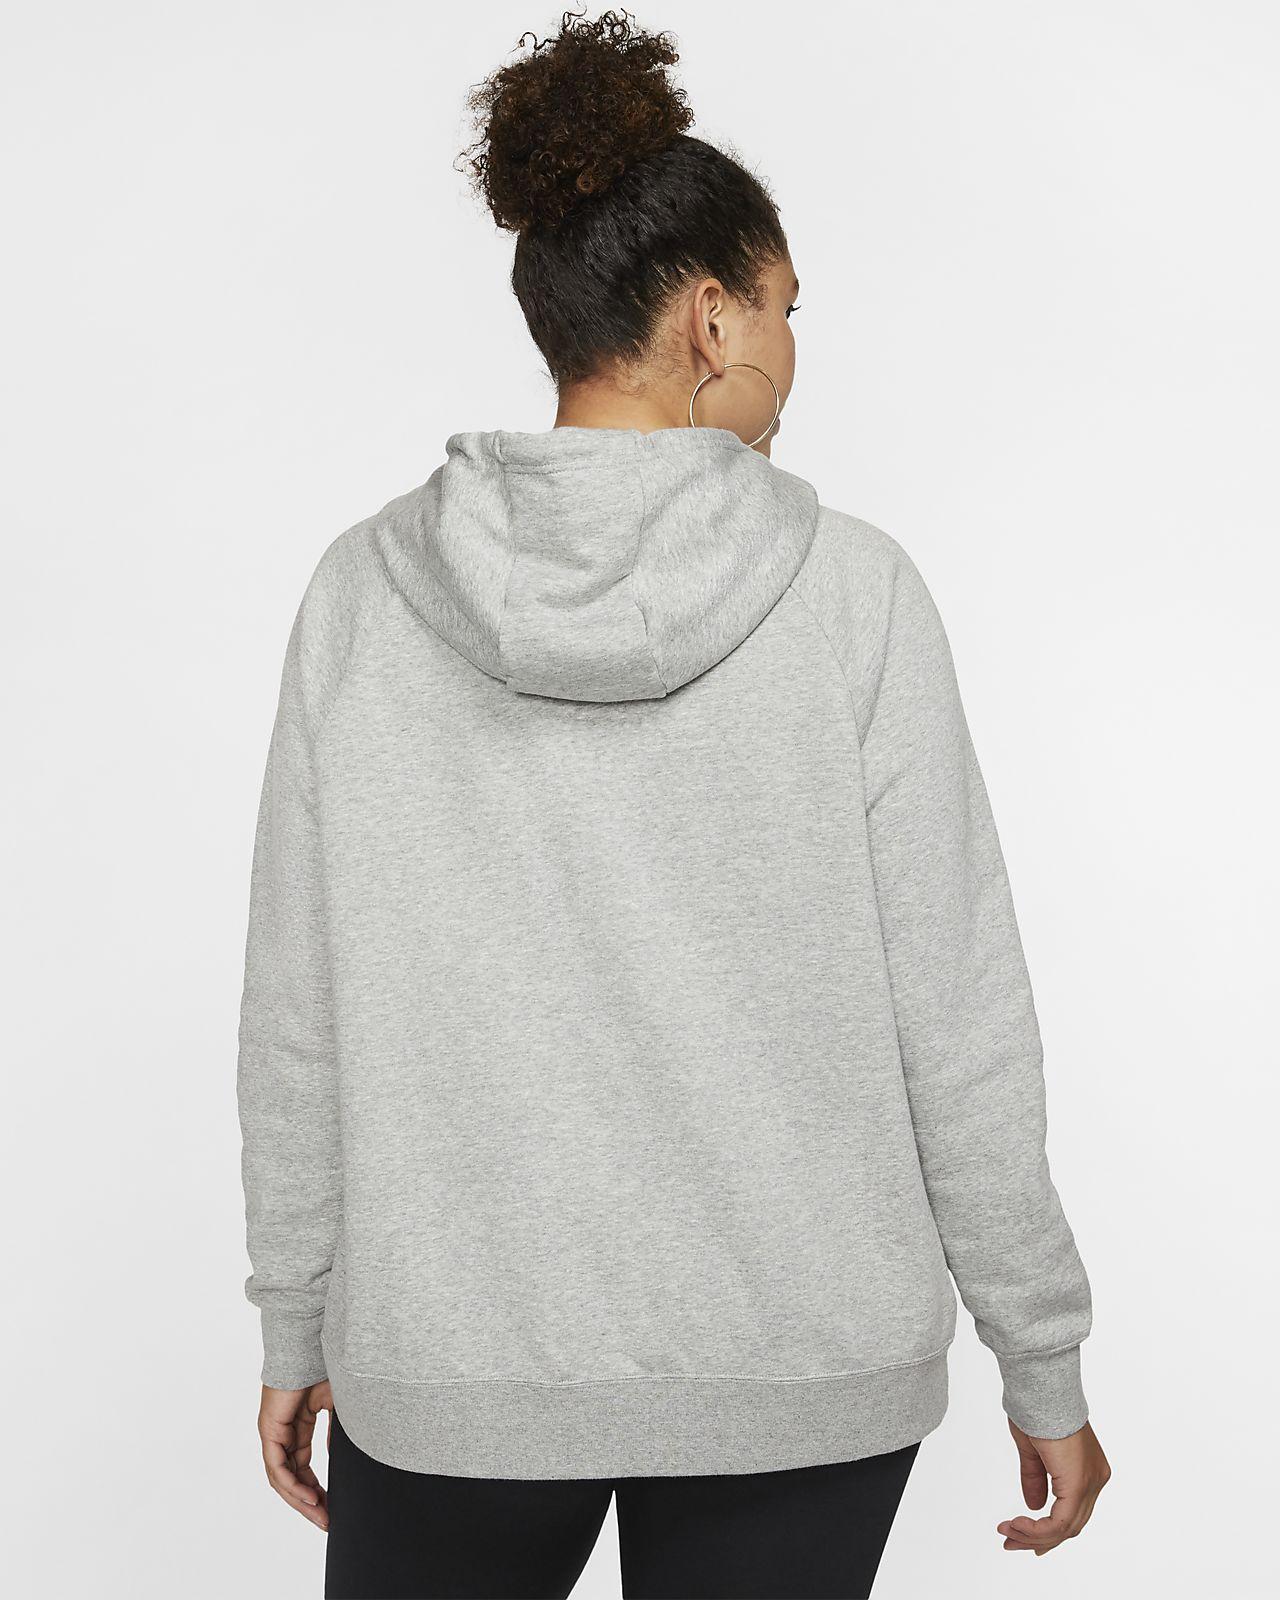 Nike Sportswear Essential kapucnis, belebújós polár női pulóver (plus size méret)